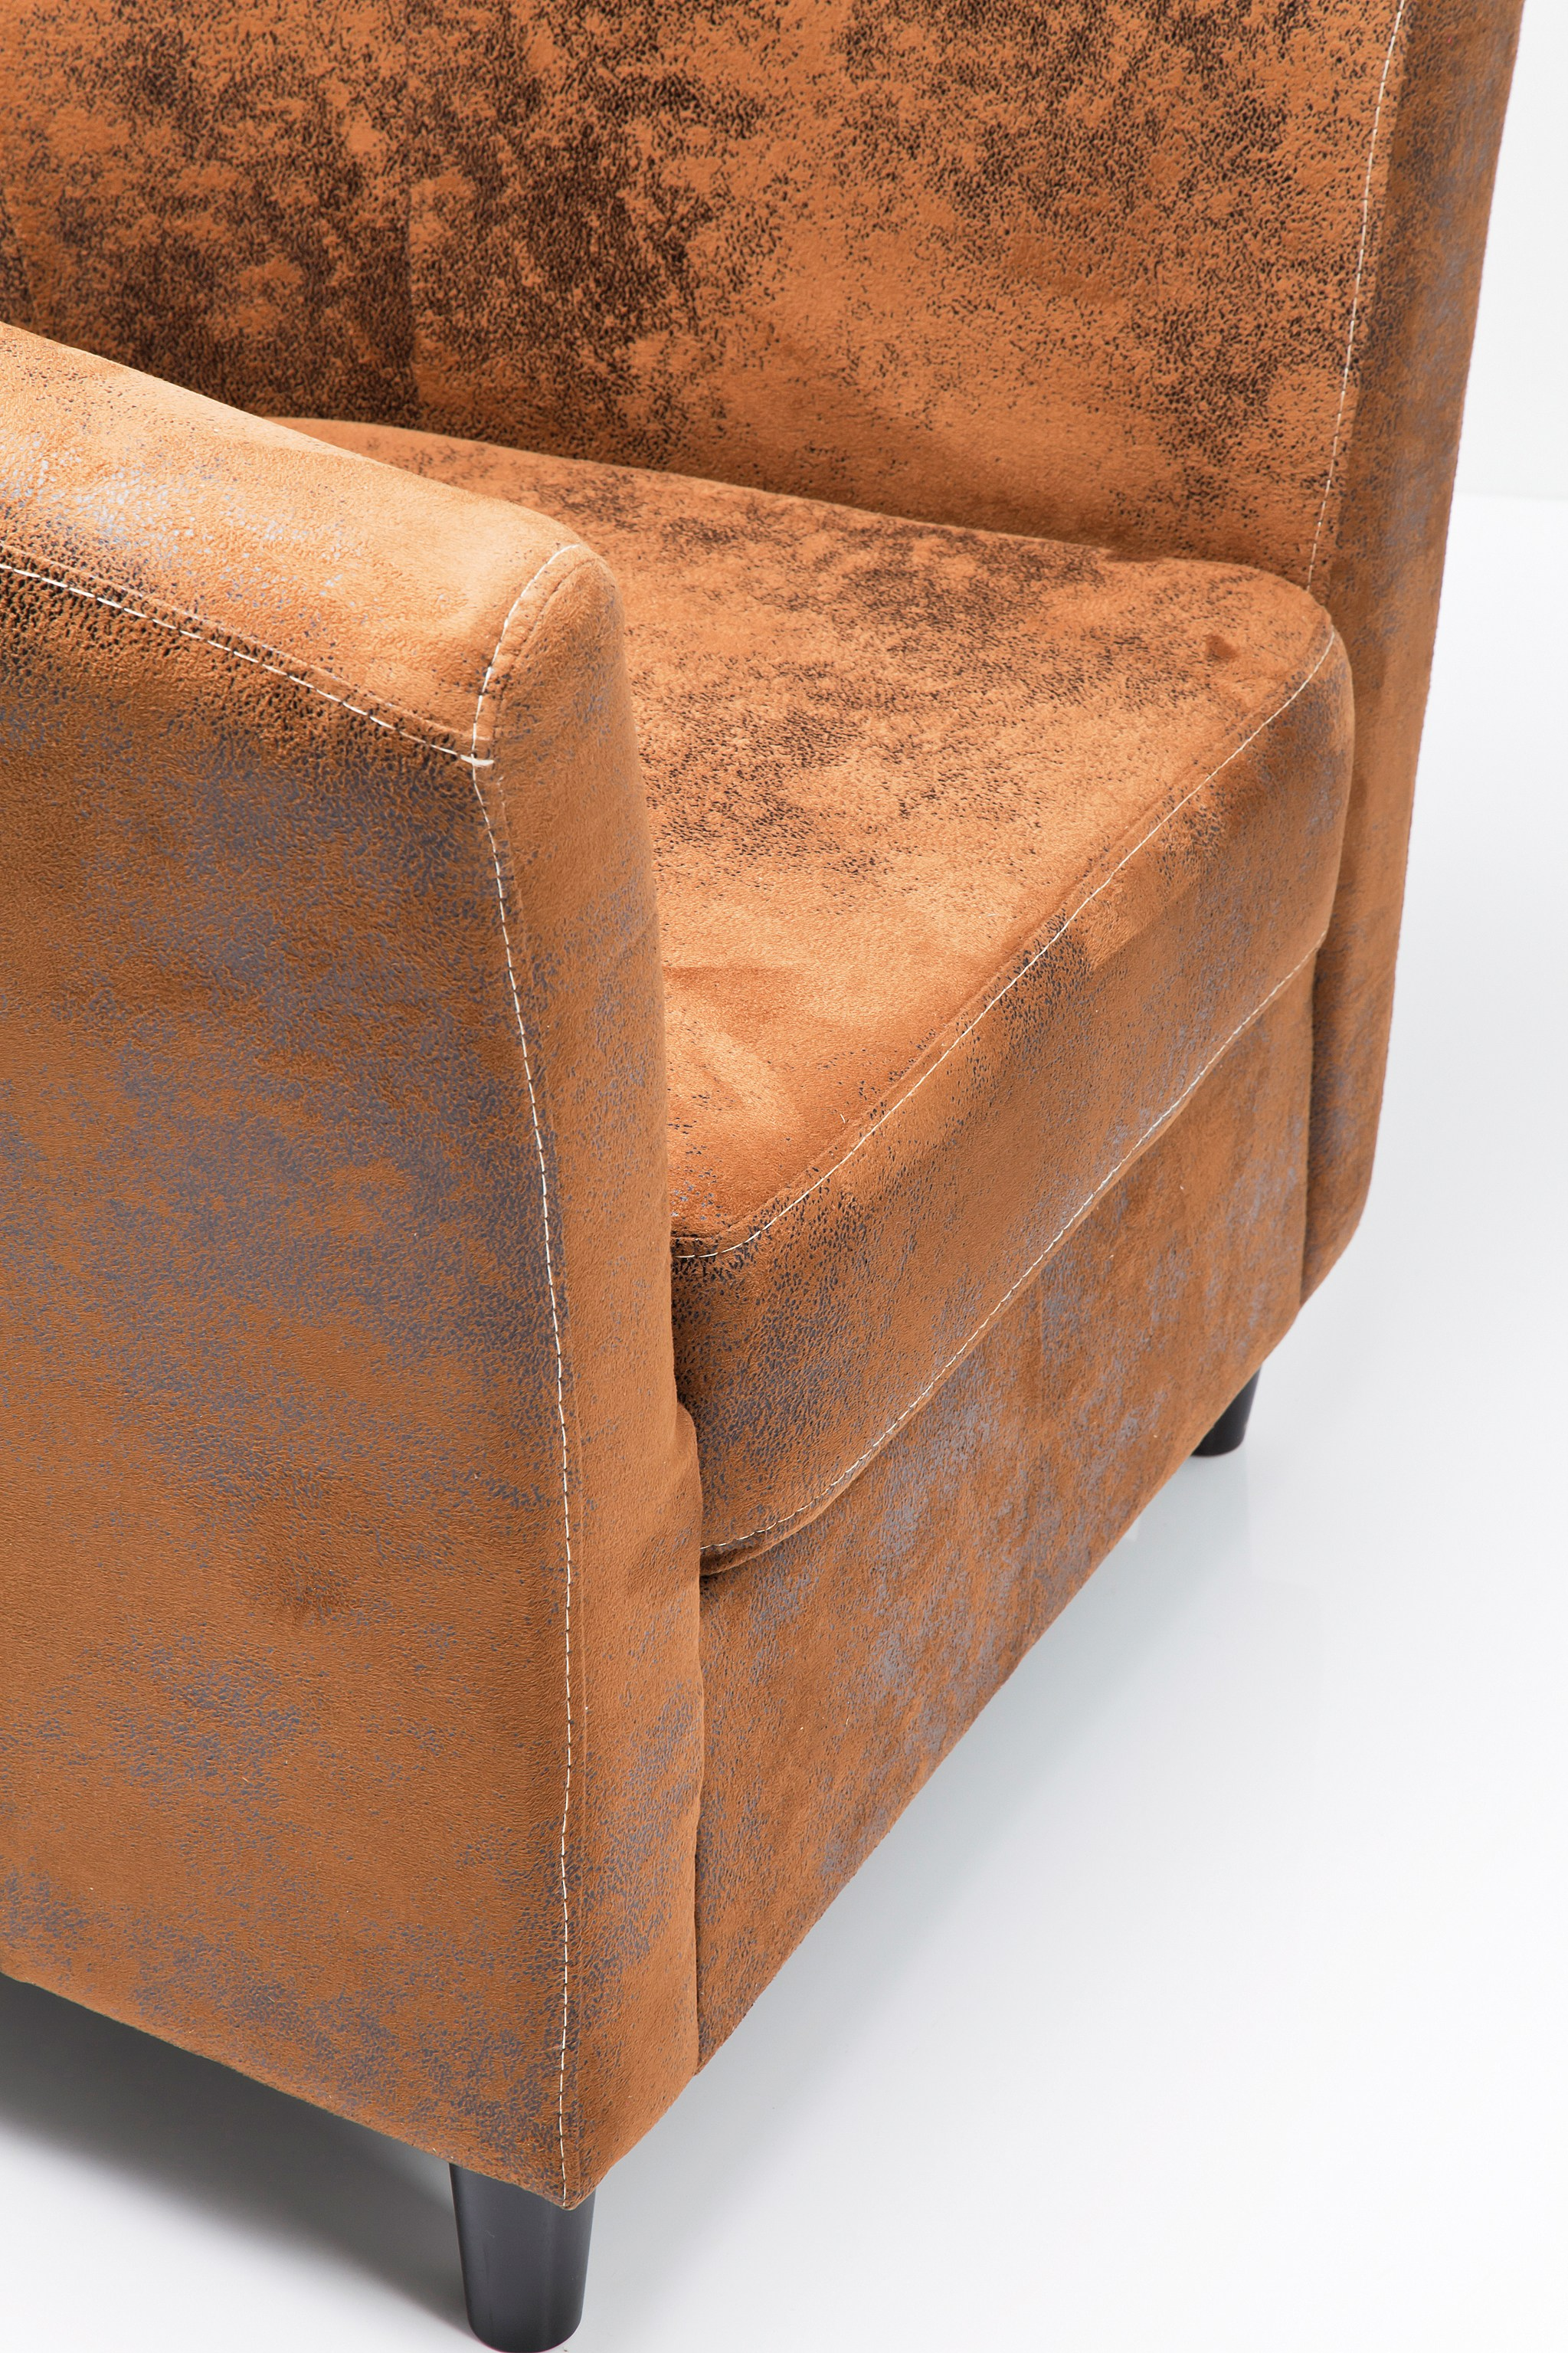 poltrona imbottita in pelle in stile vintage con braccioli africano vintage eco by kare design. Black Bedroom Furniture Sets. Home Design Ideas